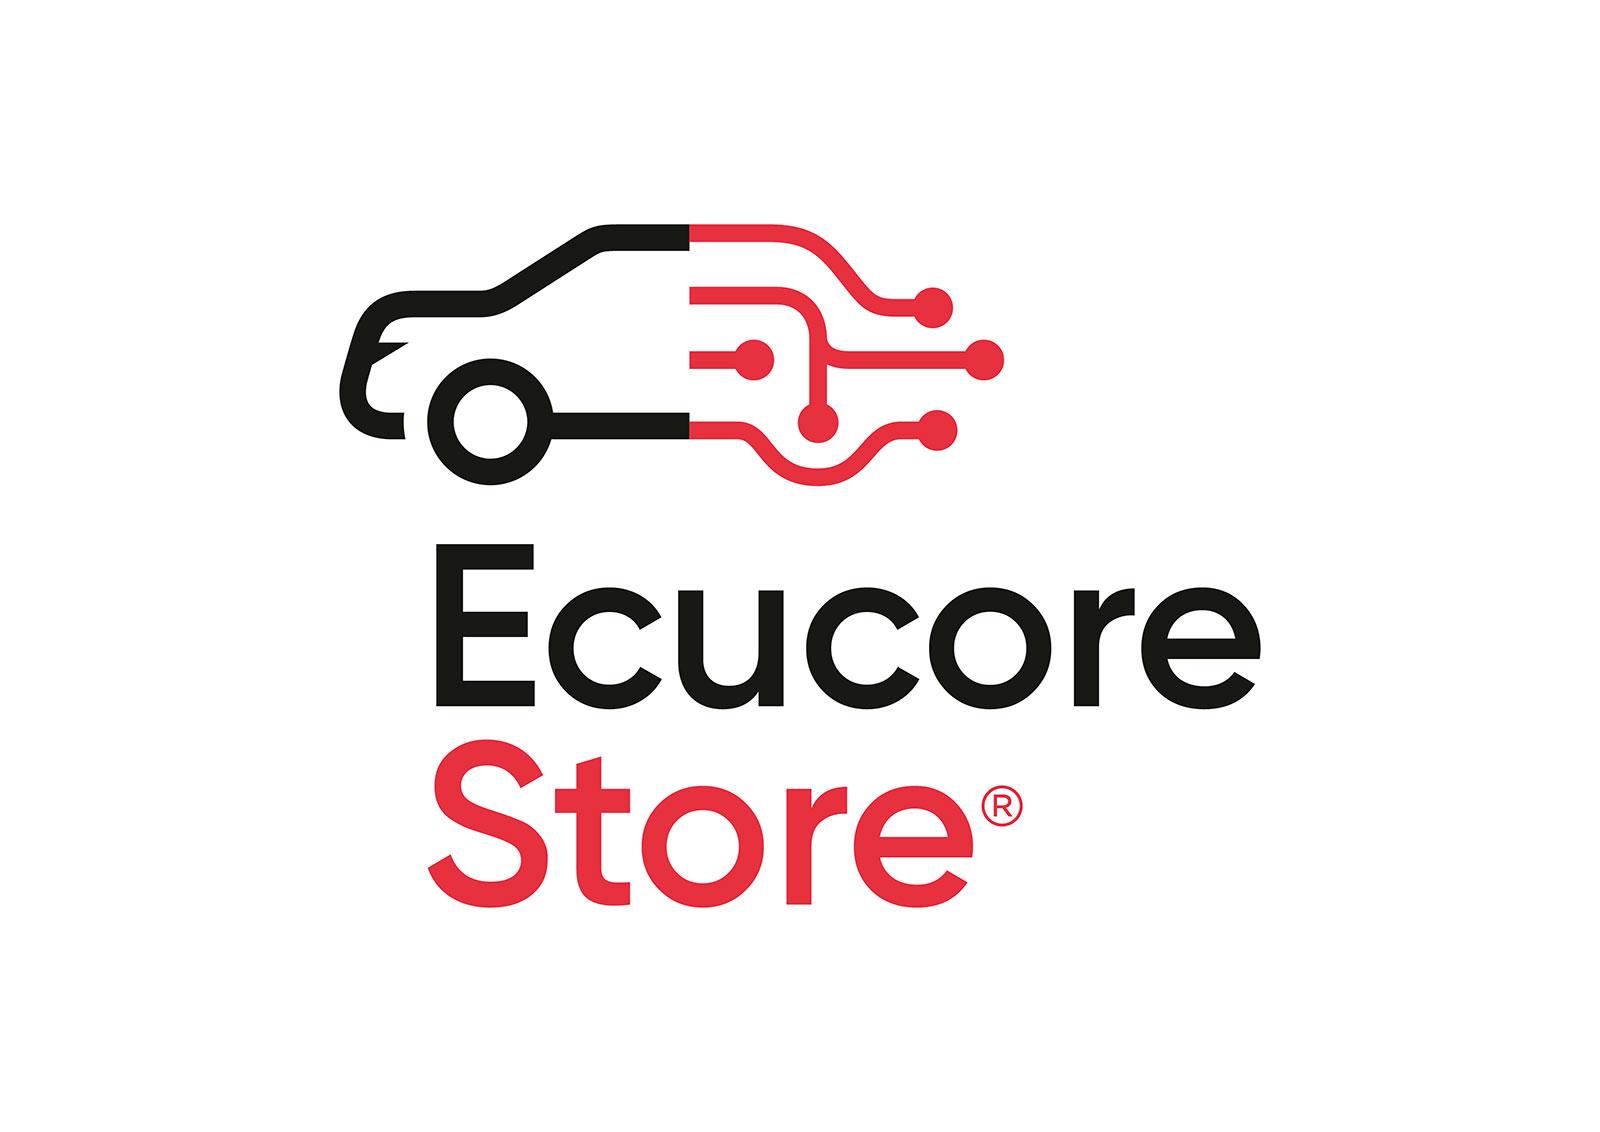 Ecucore Store